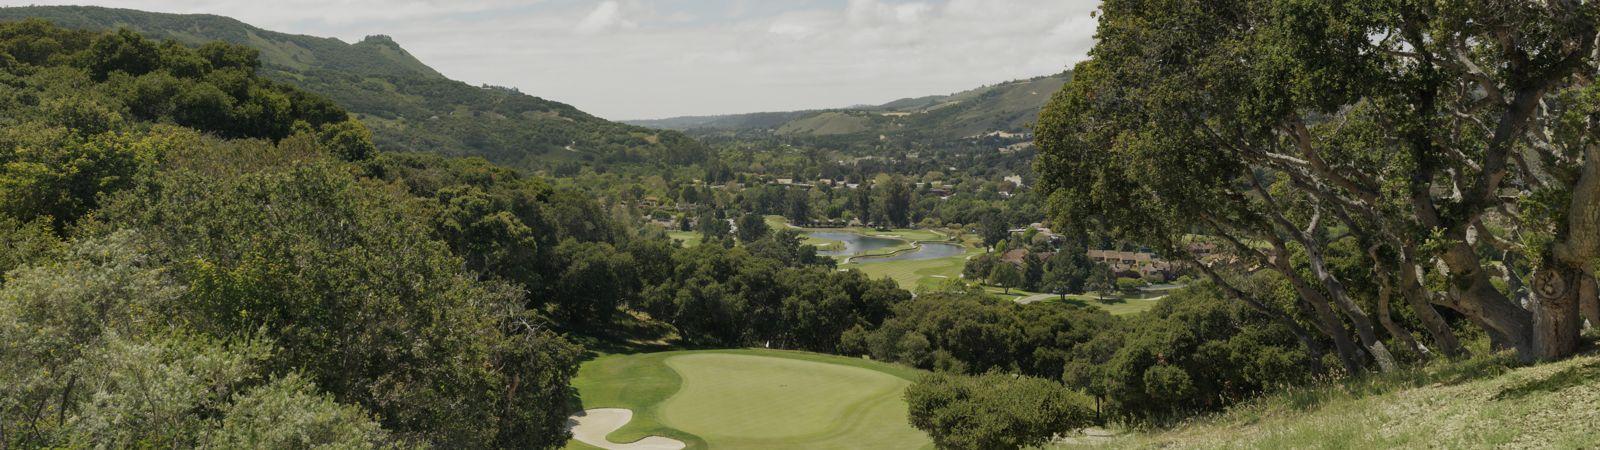 Carmel Valley Golf Course 01 THS0614